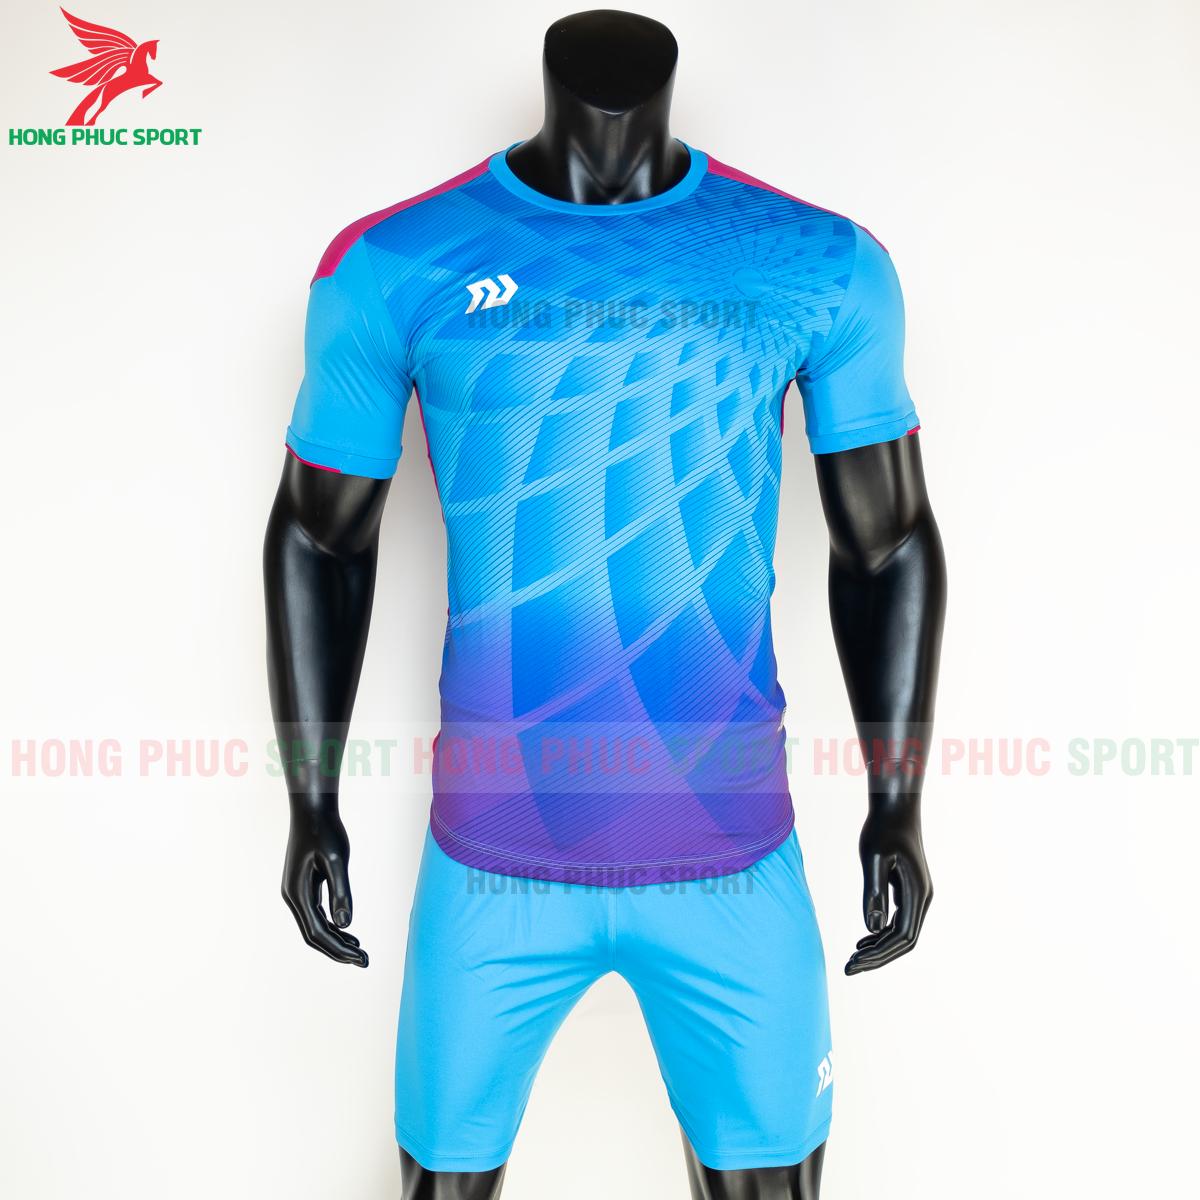 https://cdn.hongphucsport.com/unsafe/s4.shopbay.vn/files/285/ao-bong-da-khong-logo-bulbal-lotus-mau-xanh-2-60501014066dd.png